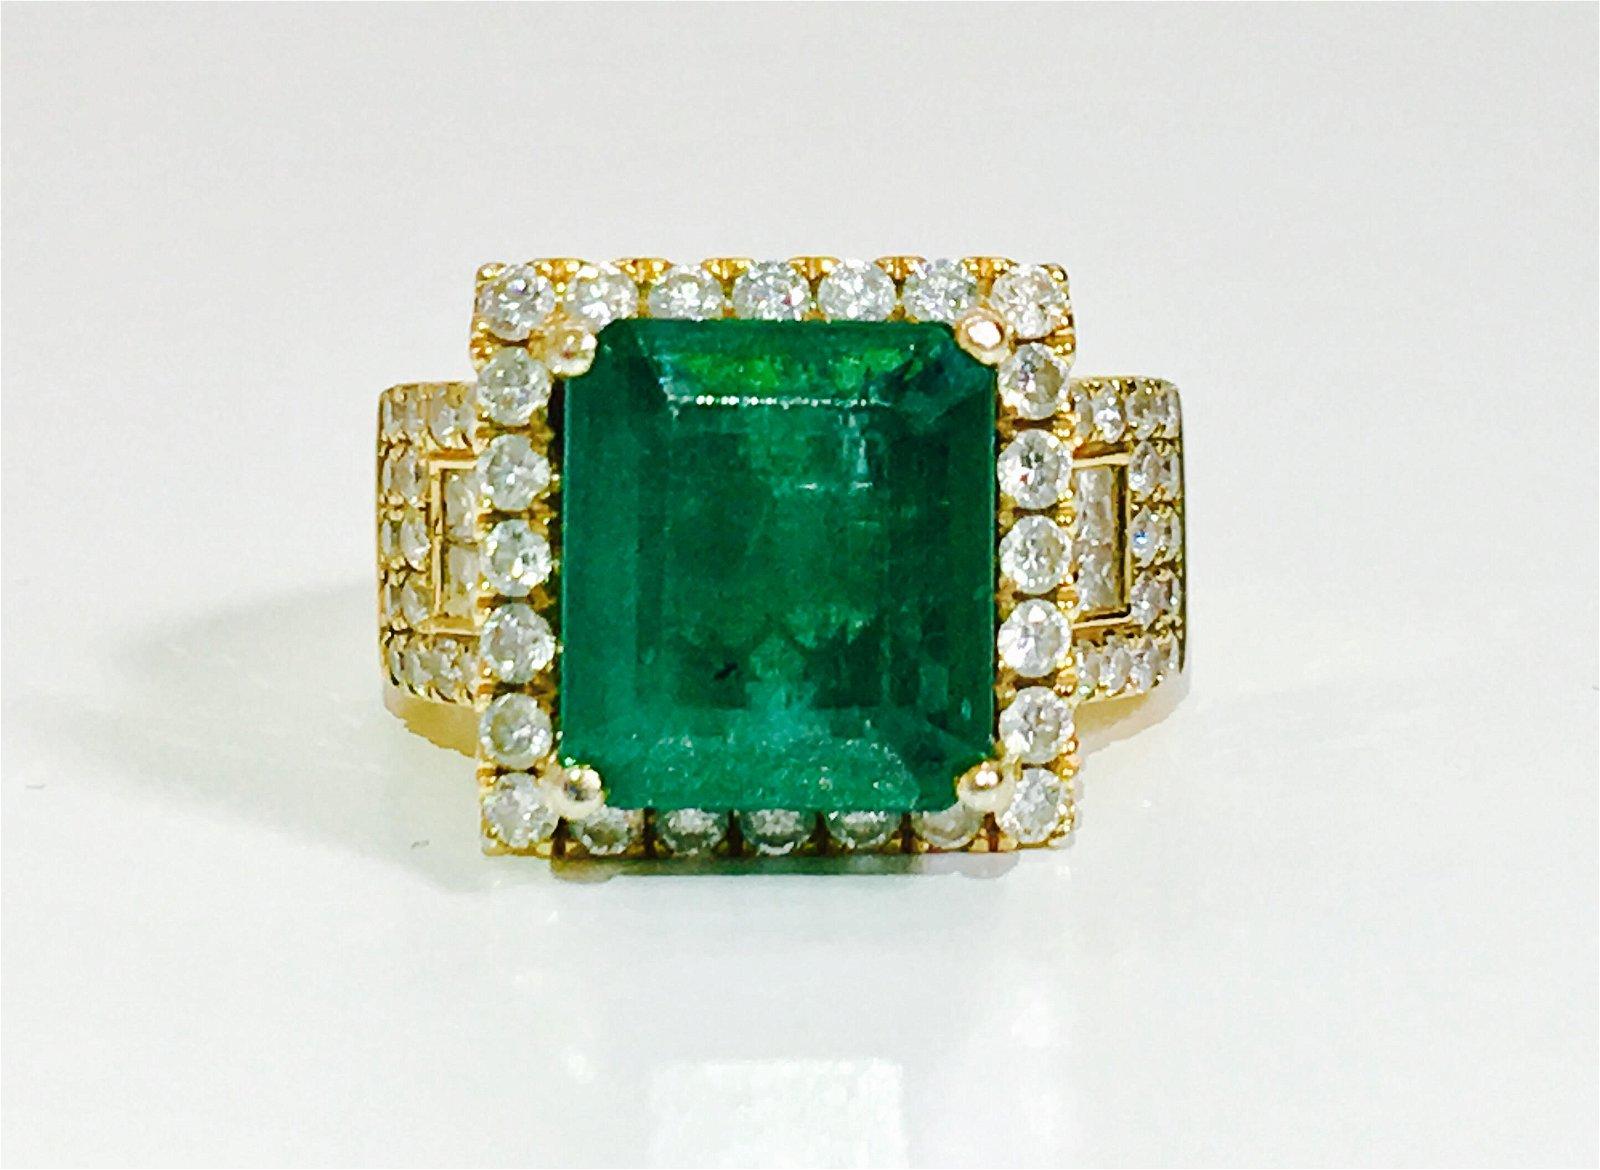 14K Gold, 7.50 Carat Diamond & Emerald Ring.